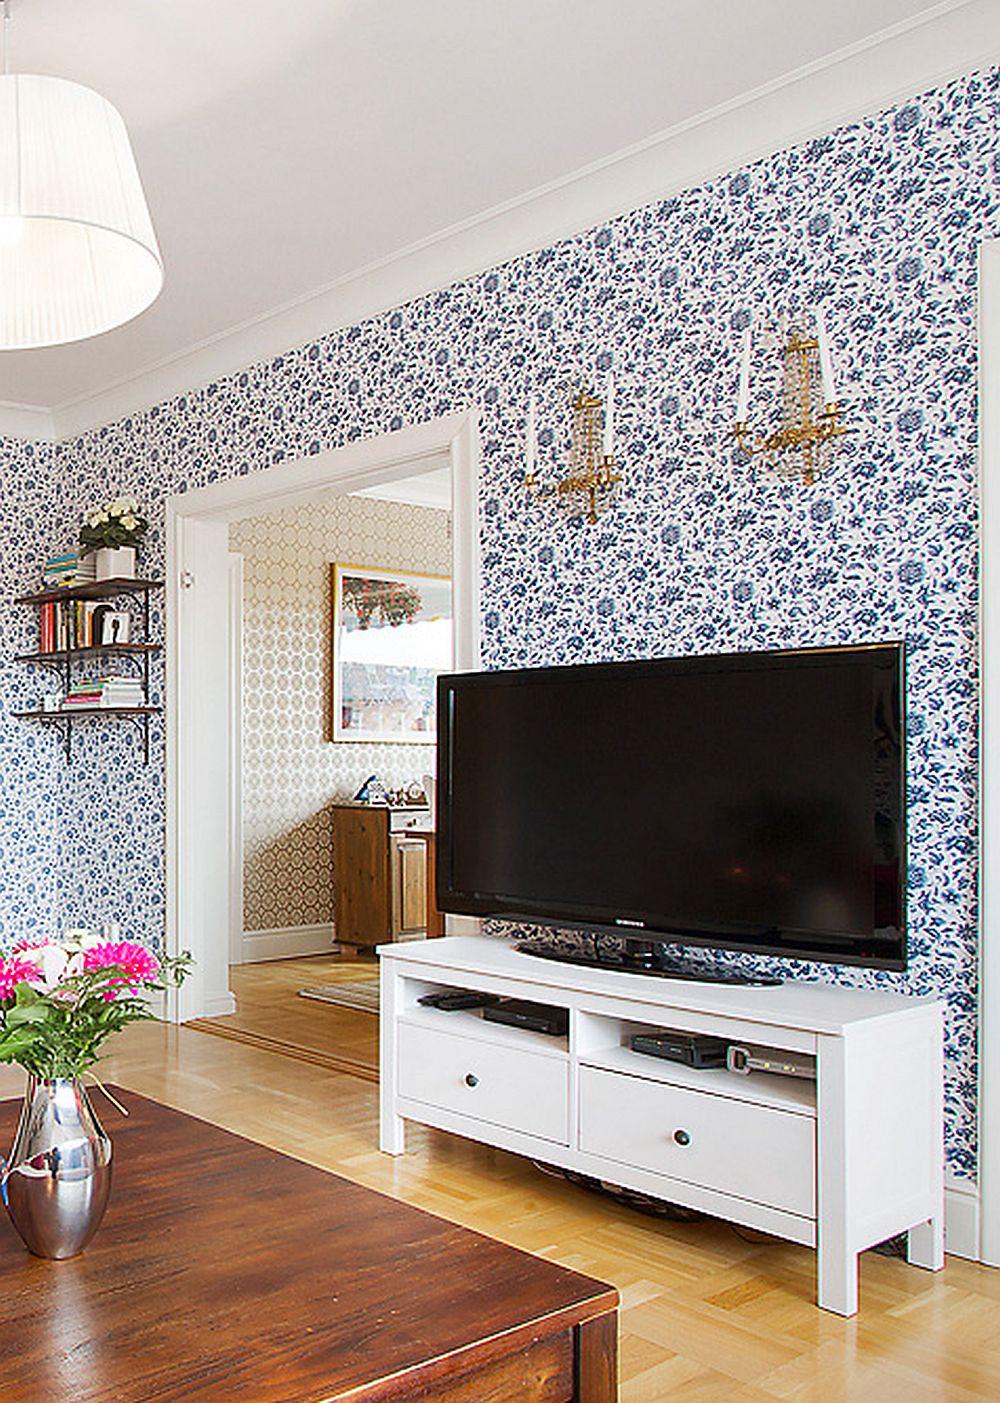 adelaparvu.com apartament de familie placut amenajat, Foto Diakrit (10)